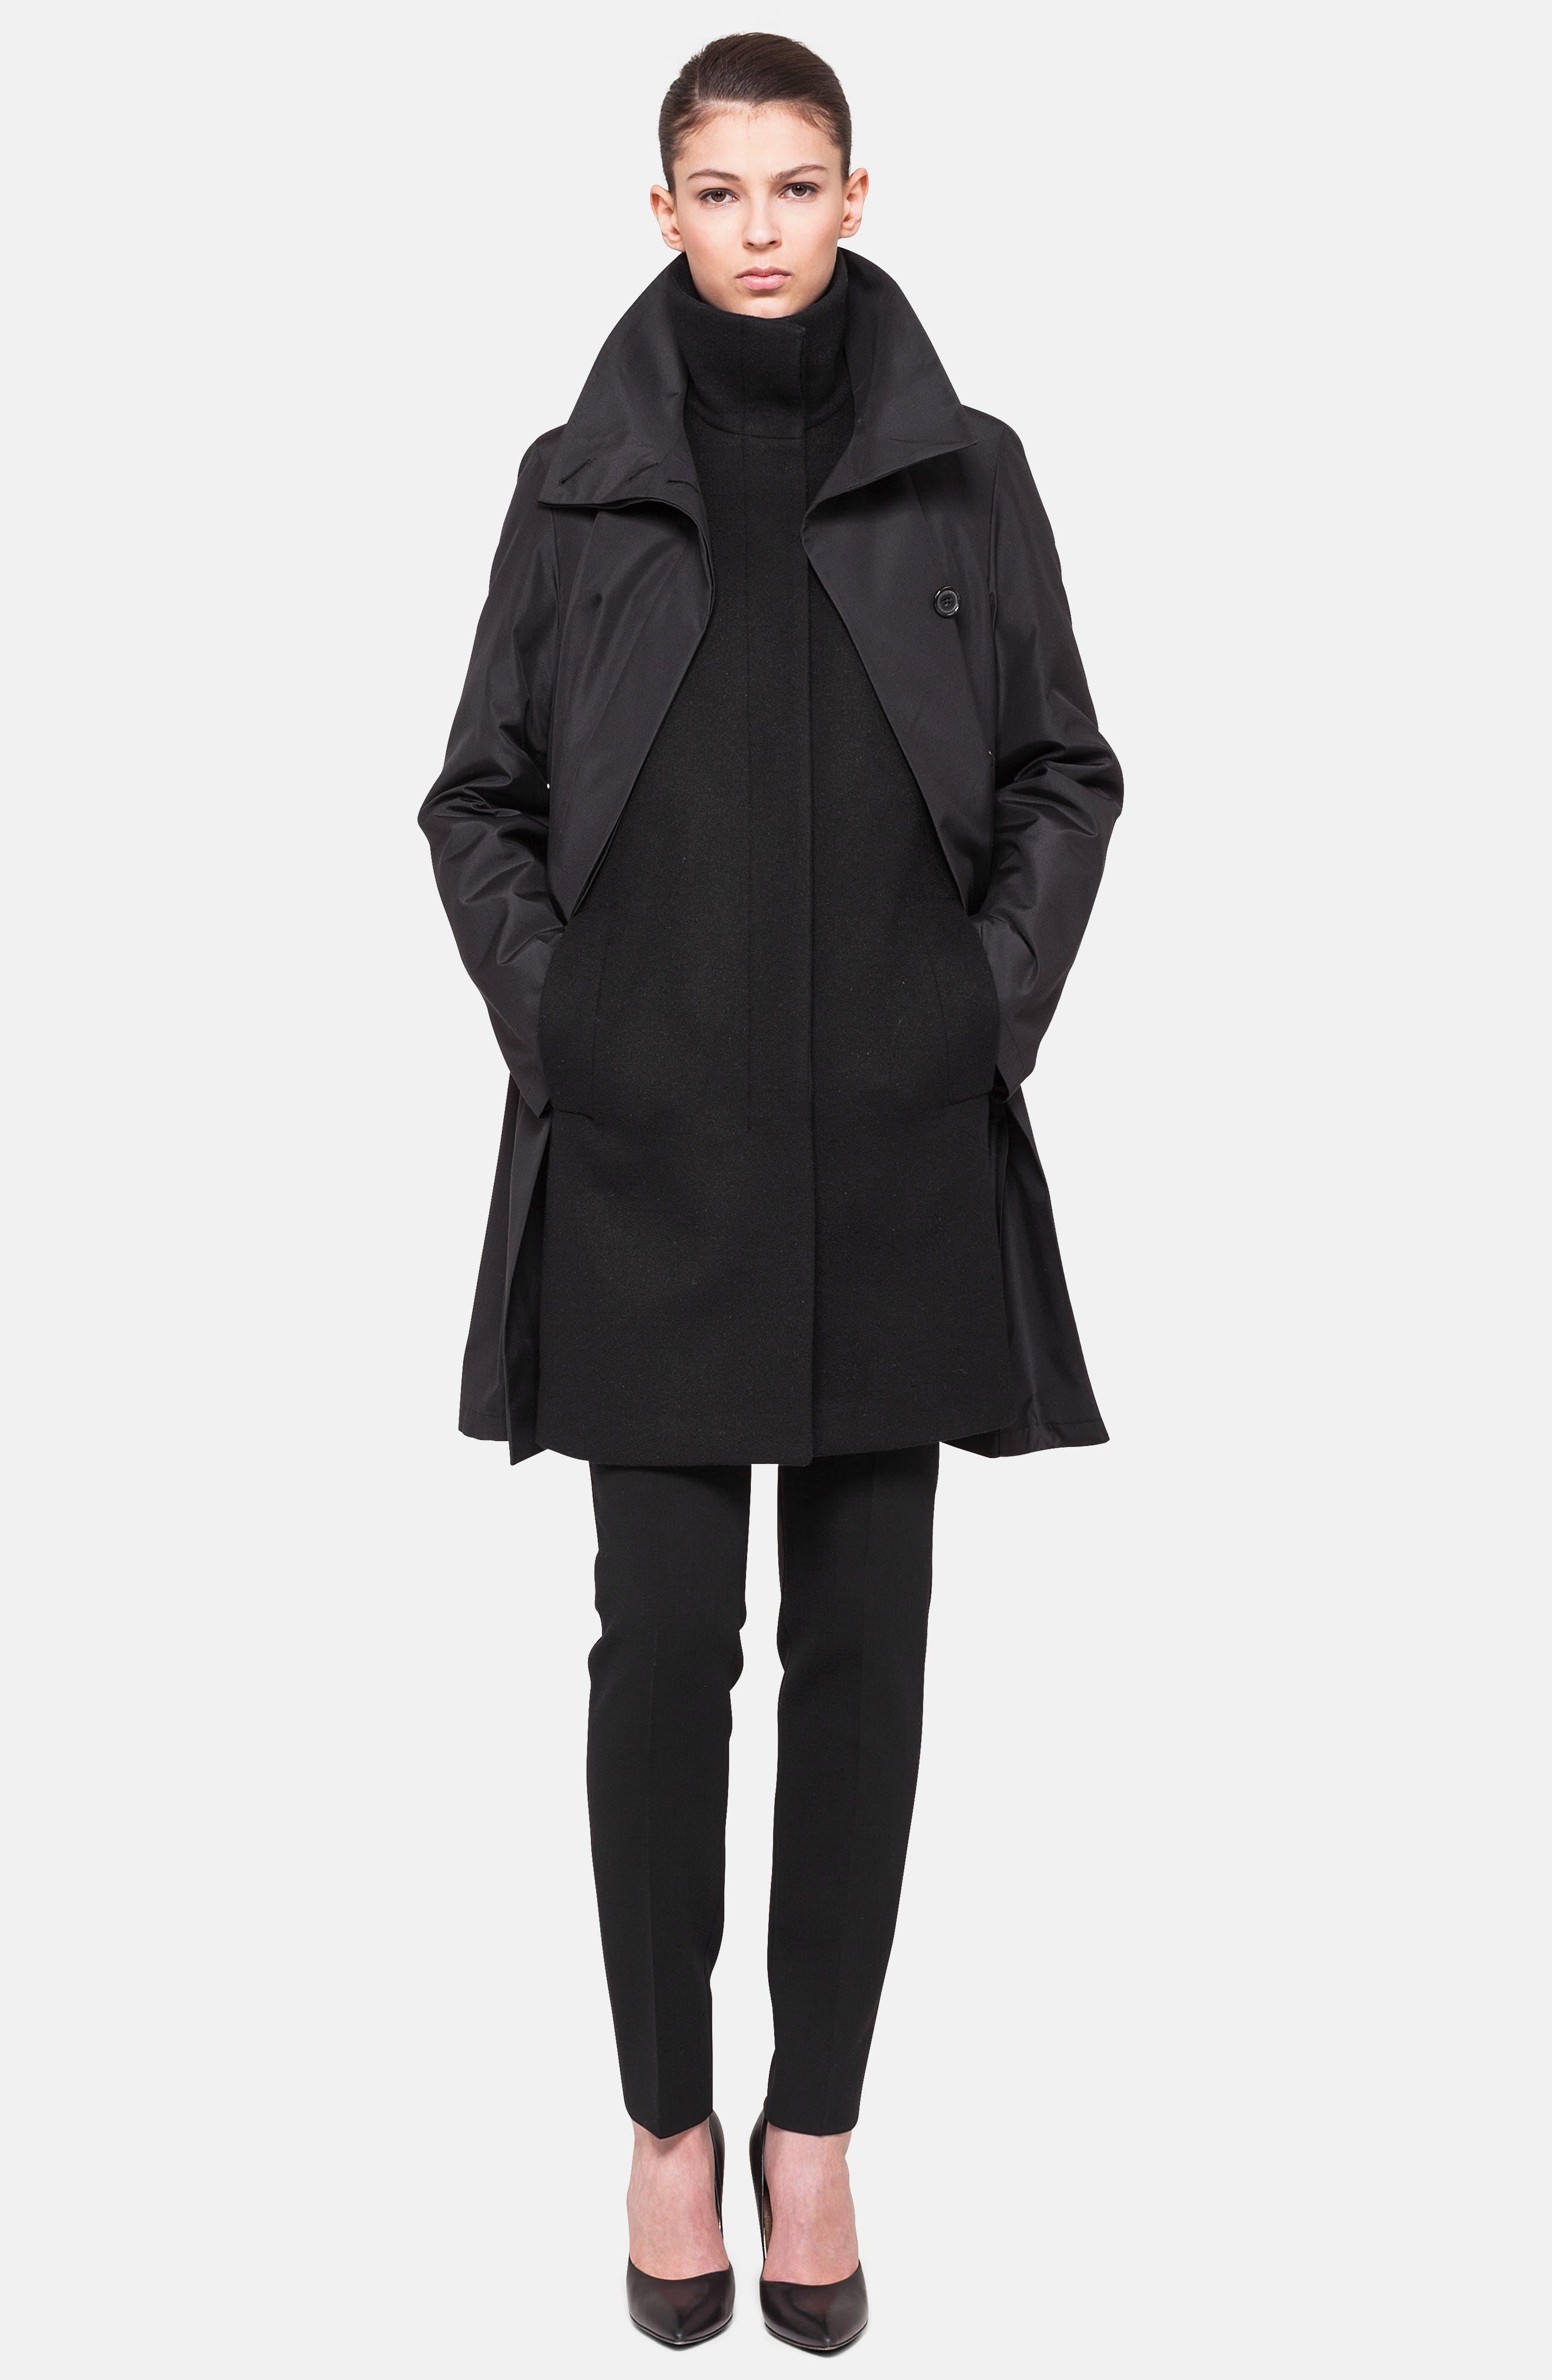 3-in-1 Technical Coat,                             Alternate thumbnail 2, color,                             BLACK